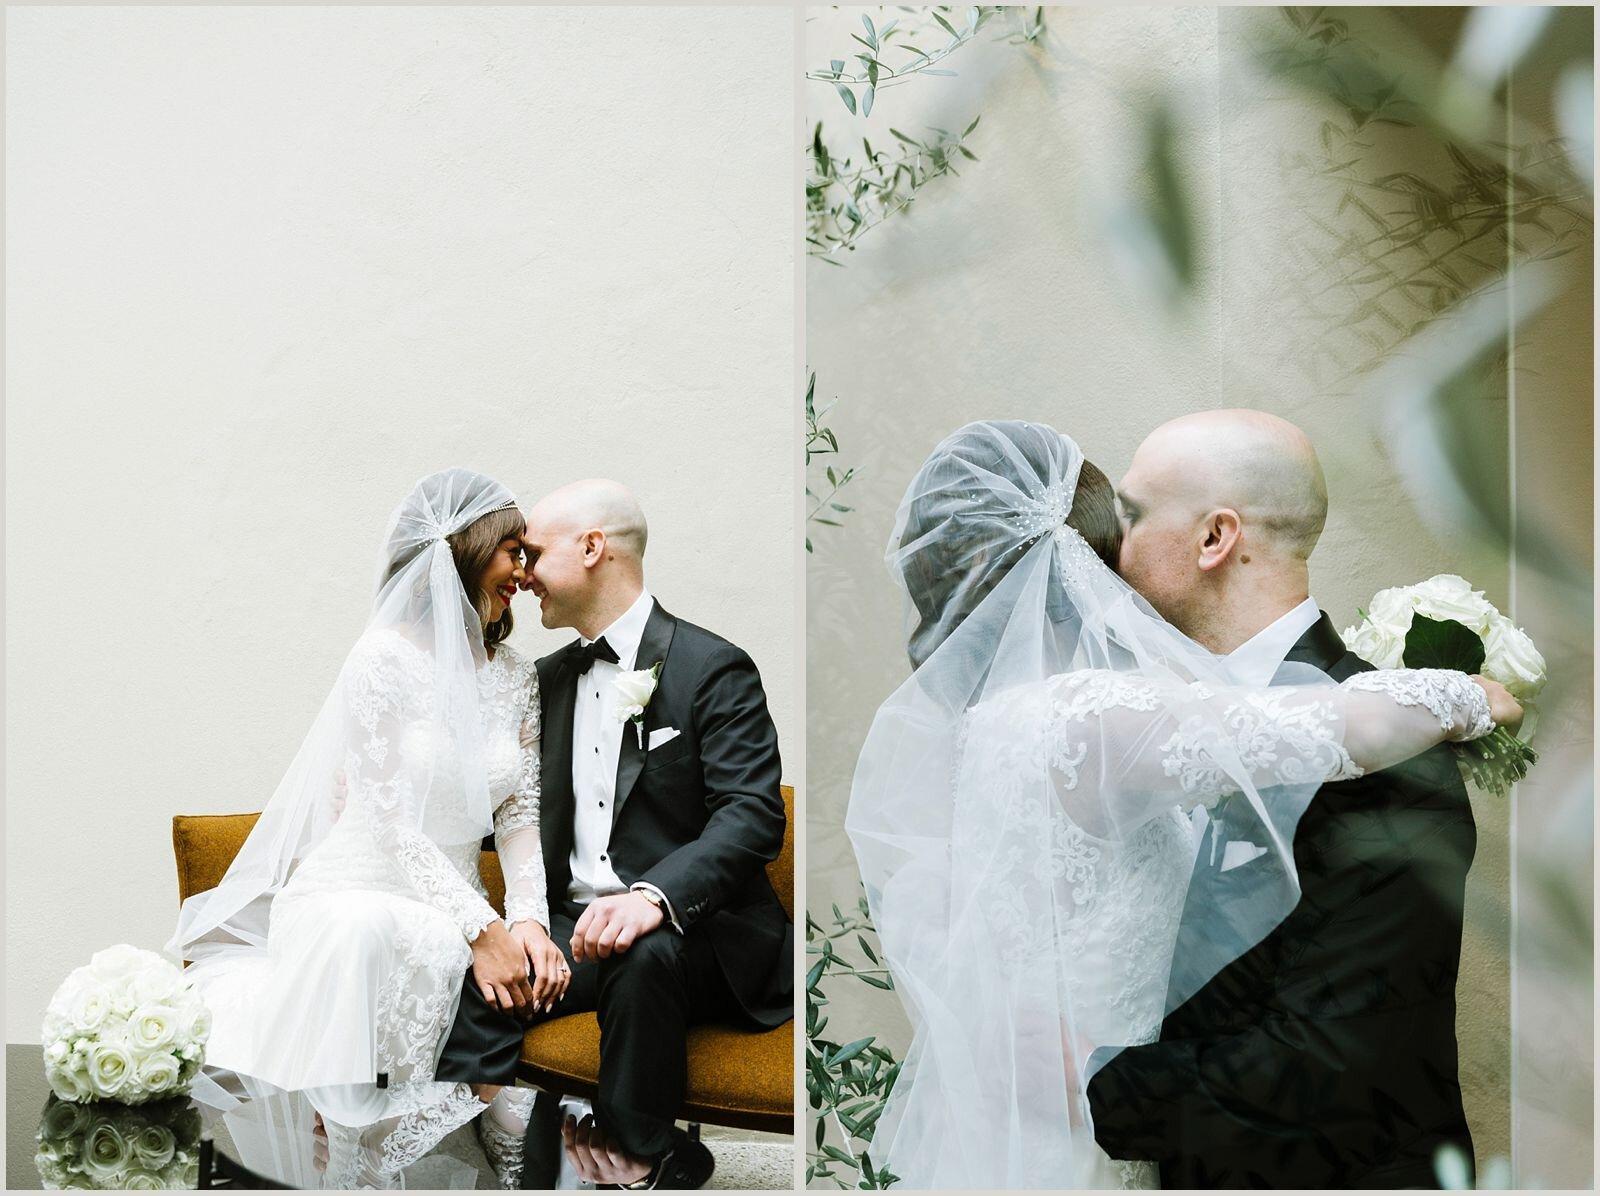 joseph_koprek_wedding_melbourne_the_prince_deck_0039.jpg